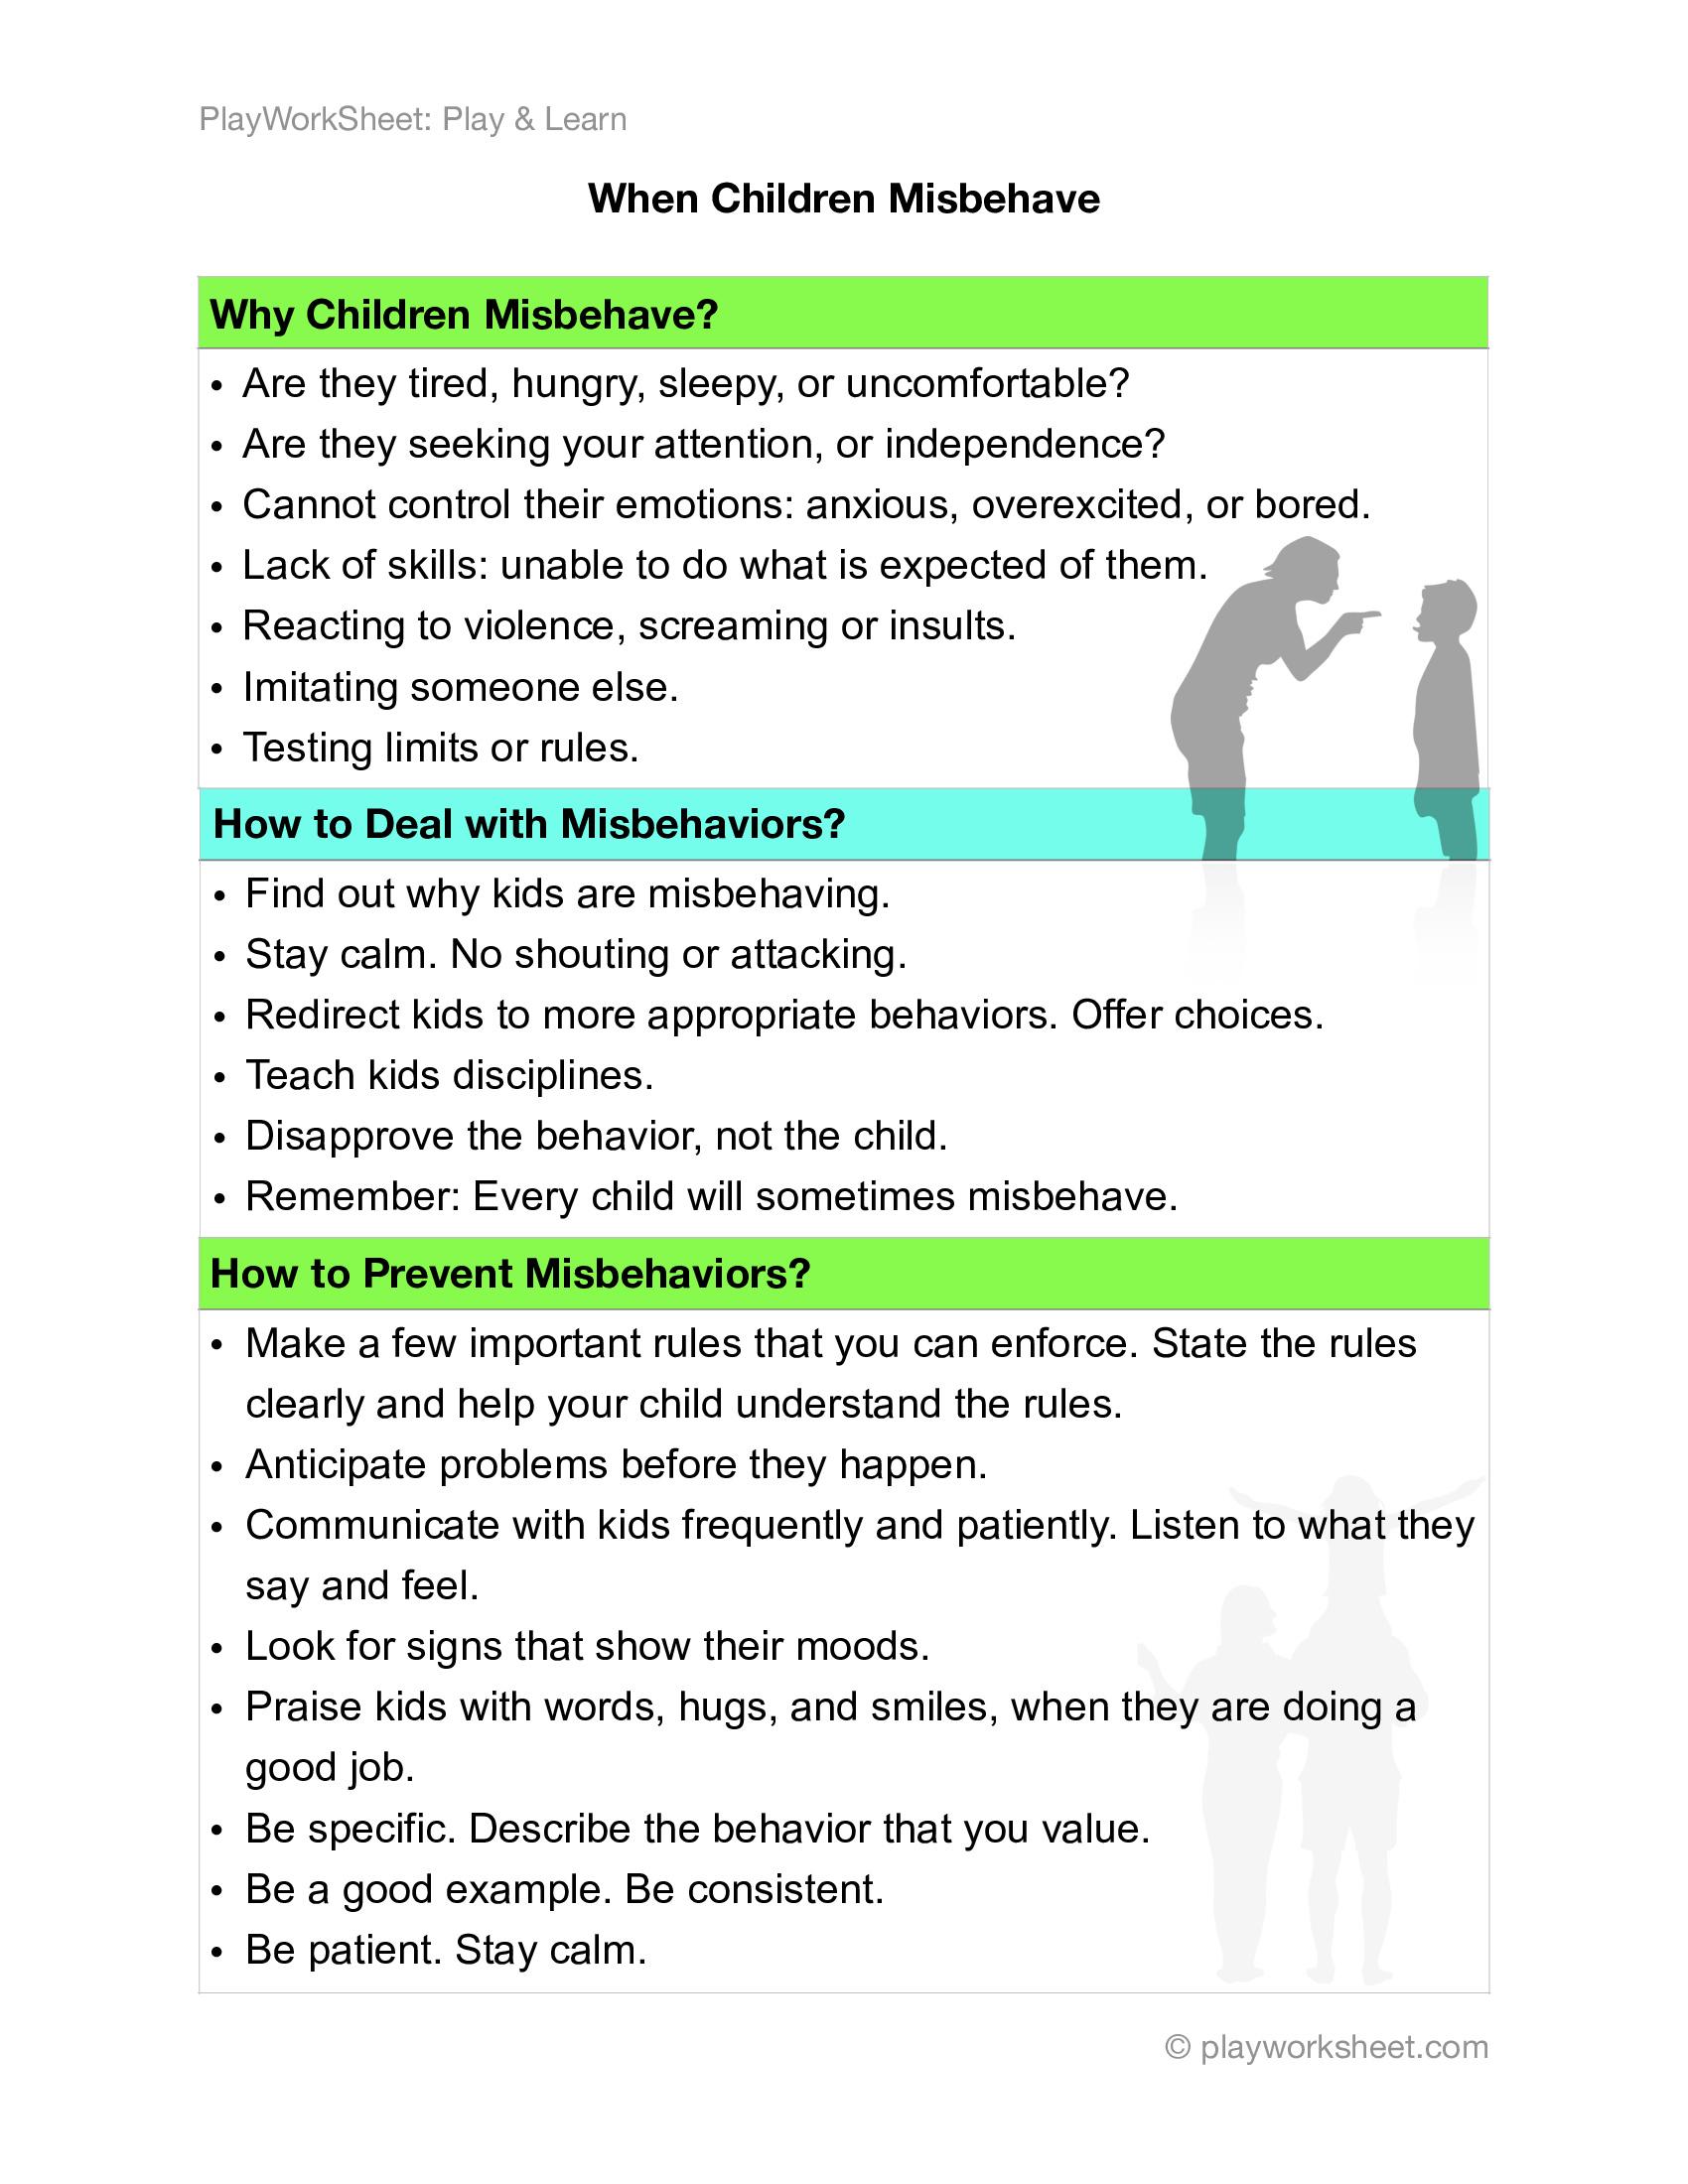 Dealing With Mishaviors